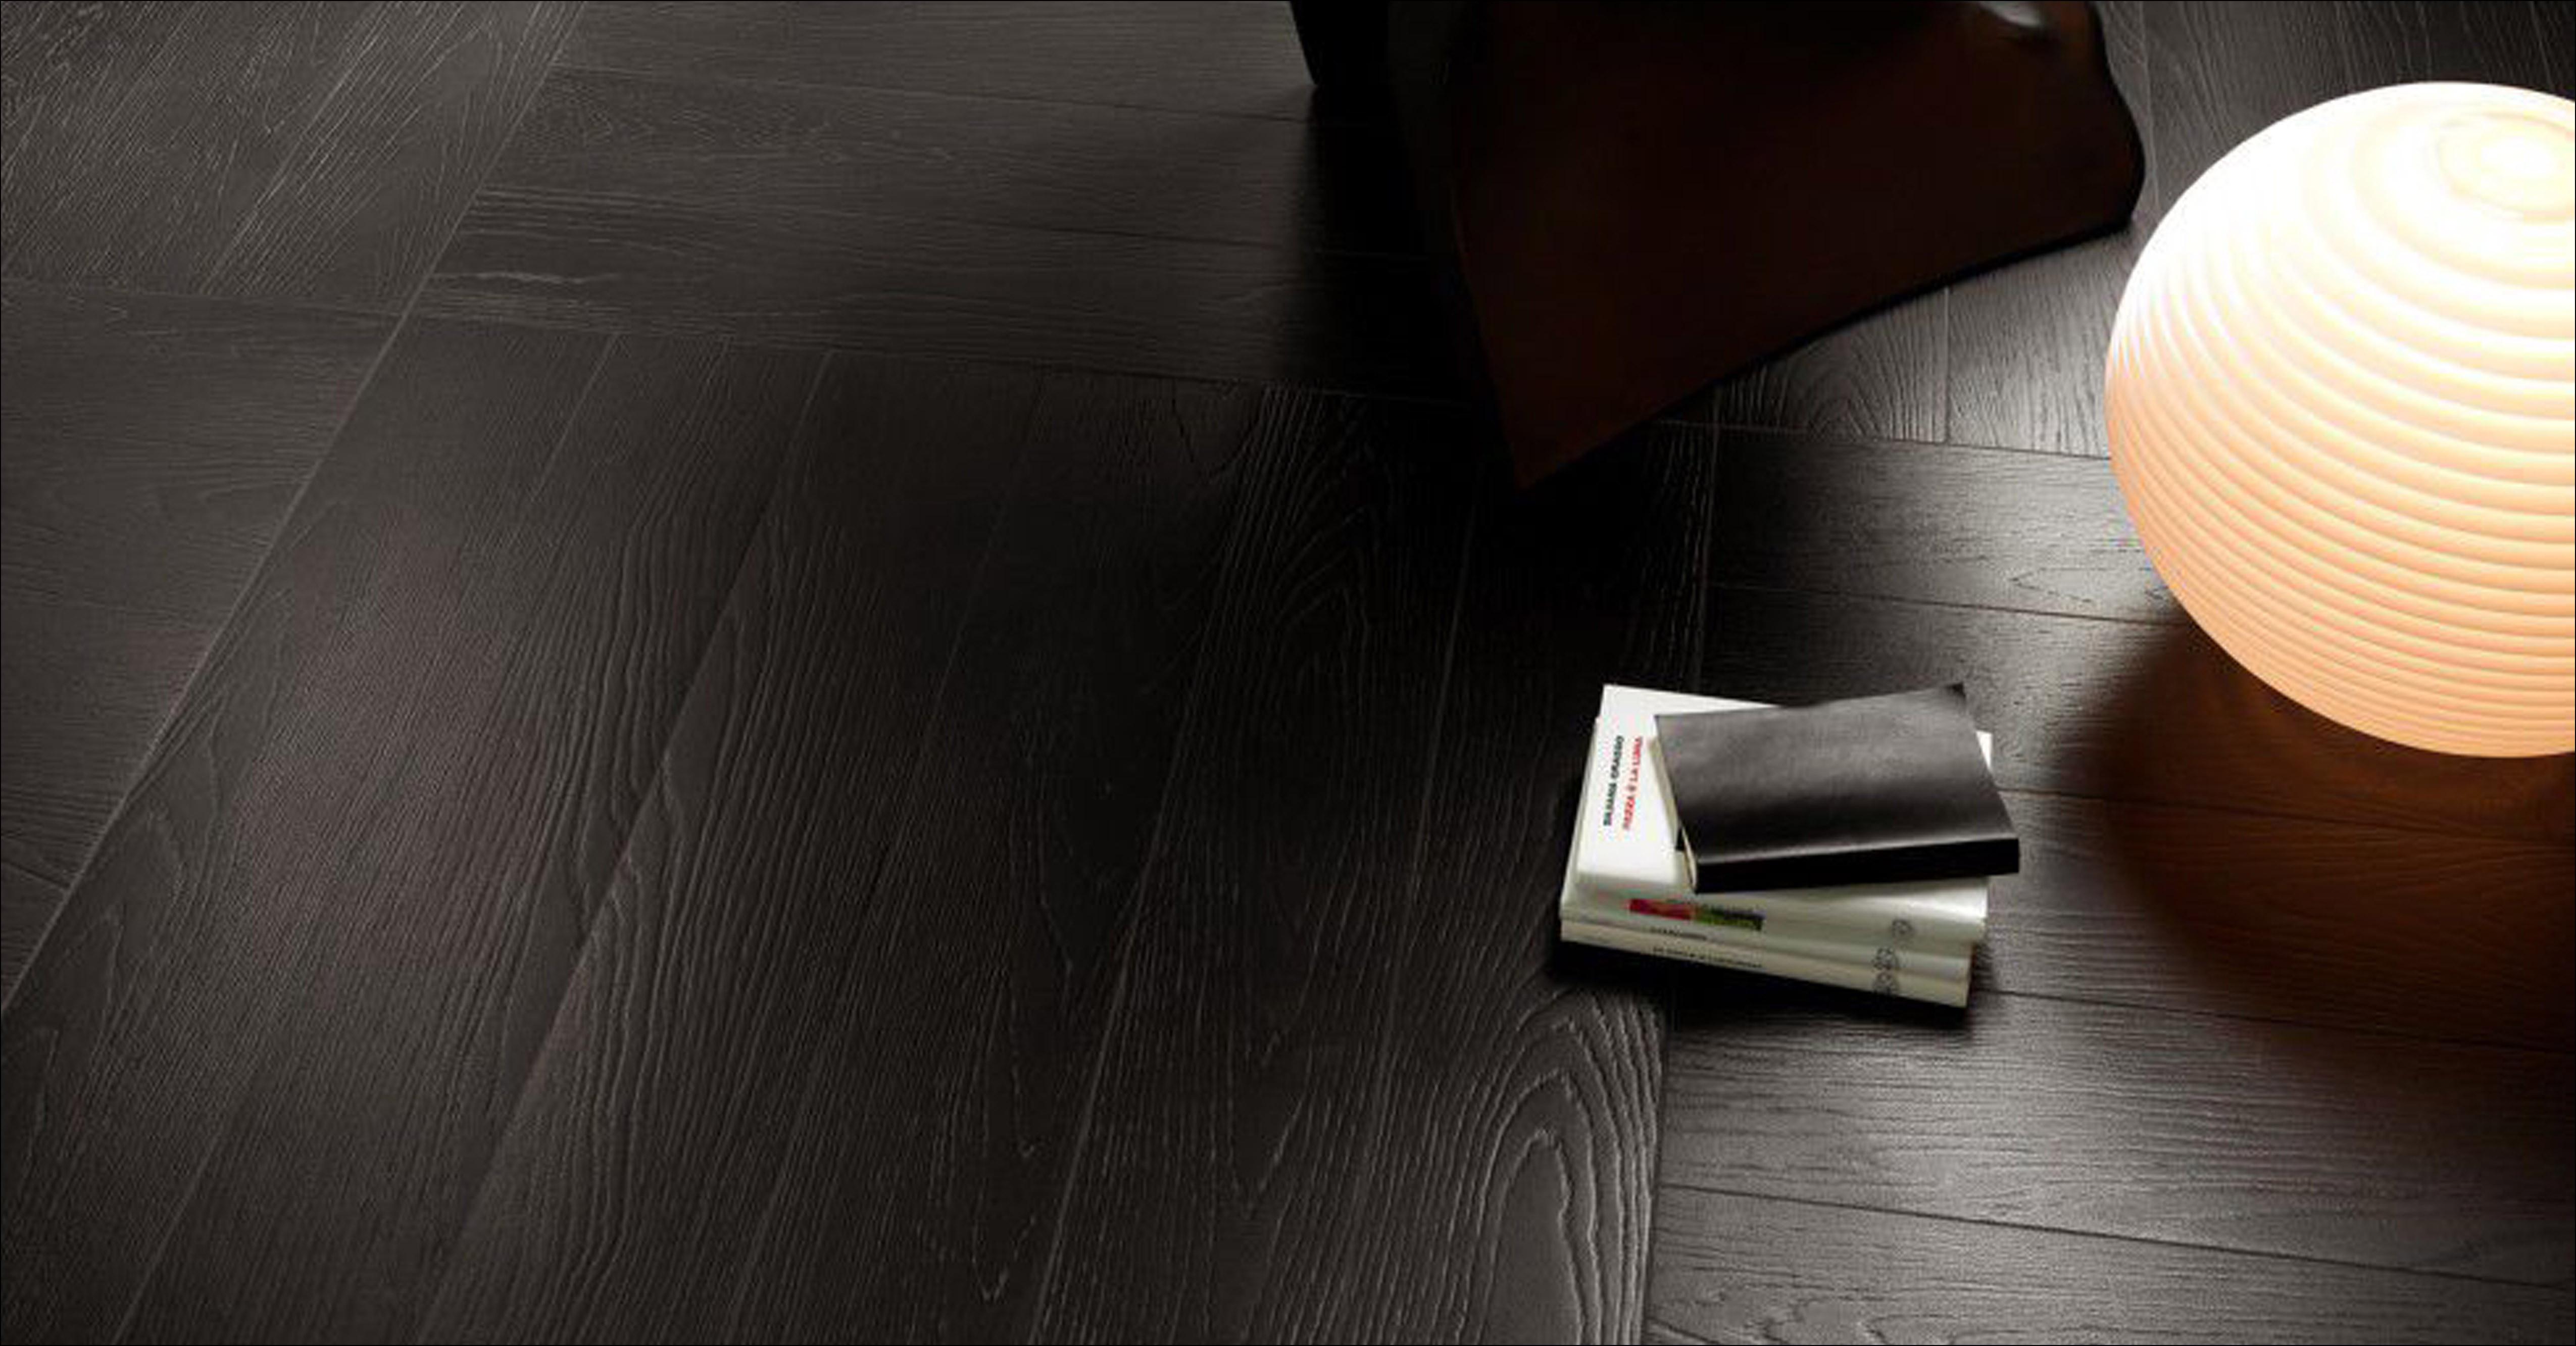 hardwood floor refinishing fayetteville nc of laminate flooring reviews flooring ideas in laminate flooring that looks like tile or stone photographies tile that looks like hardwood wood look